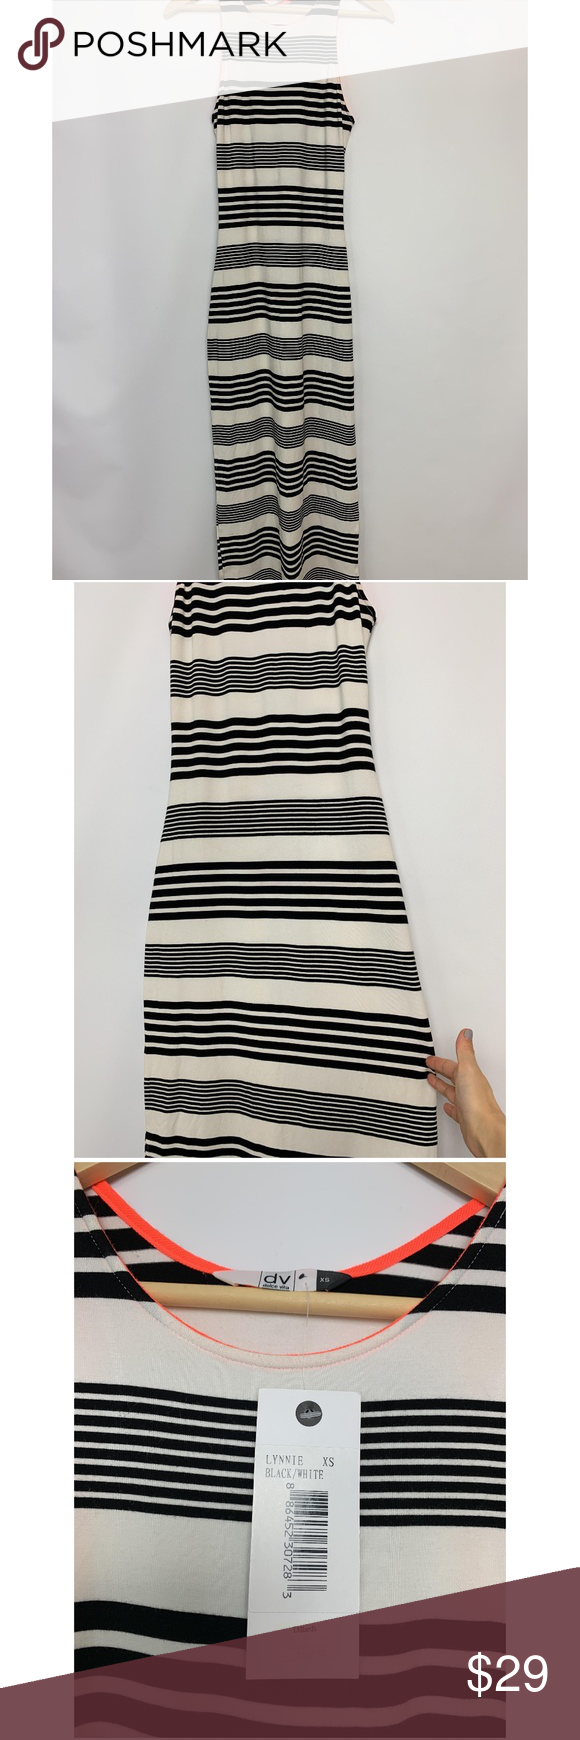 Nwt Dolce Vita Striped Stretchy 132 Maxi Dress Dolce Vita Maxi Dress Clothes Design [ 1740 x 580 Pixel ]